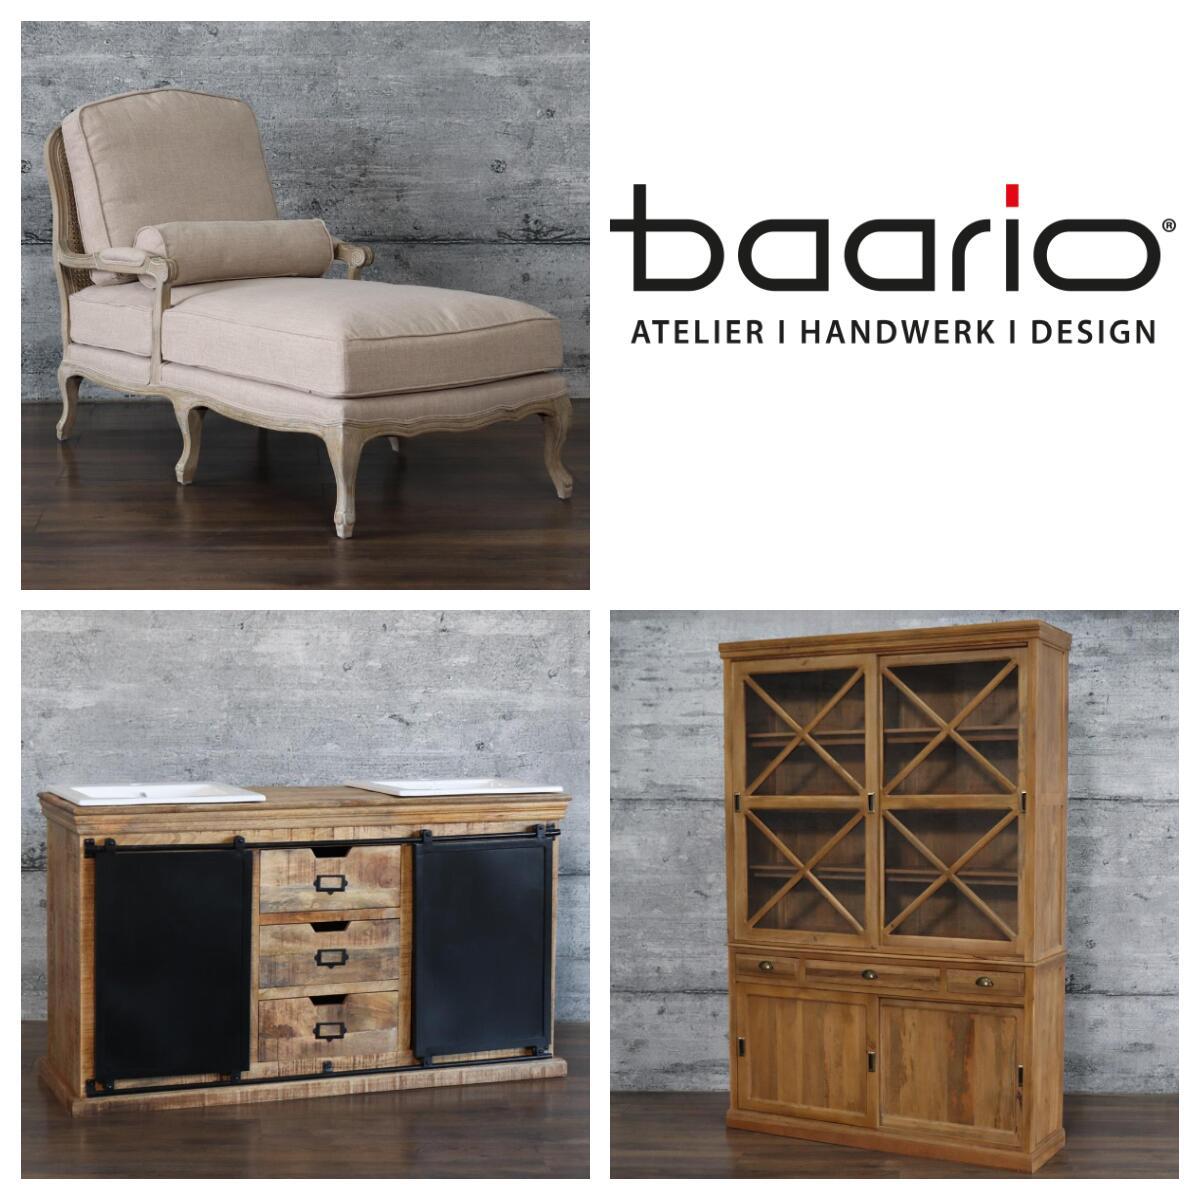 richmond-moebel-interior-design-atelier-baario